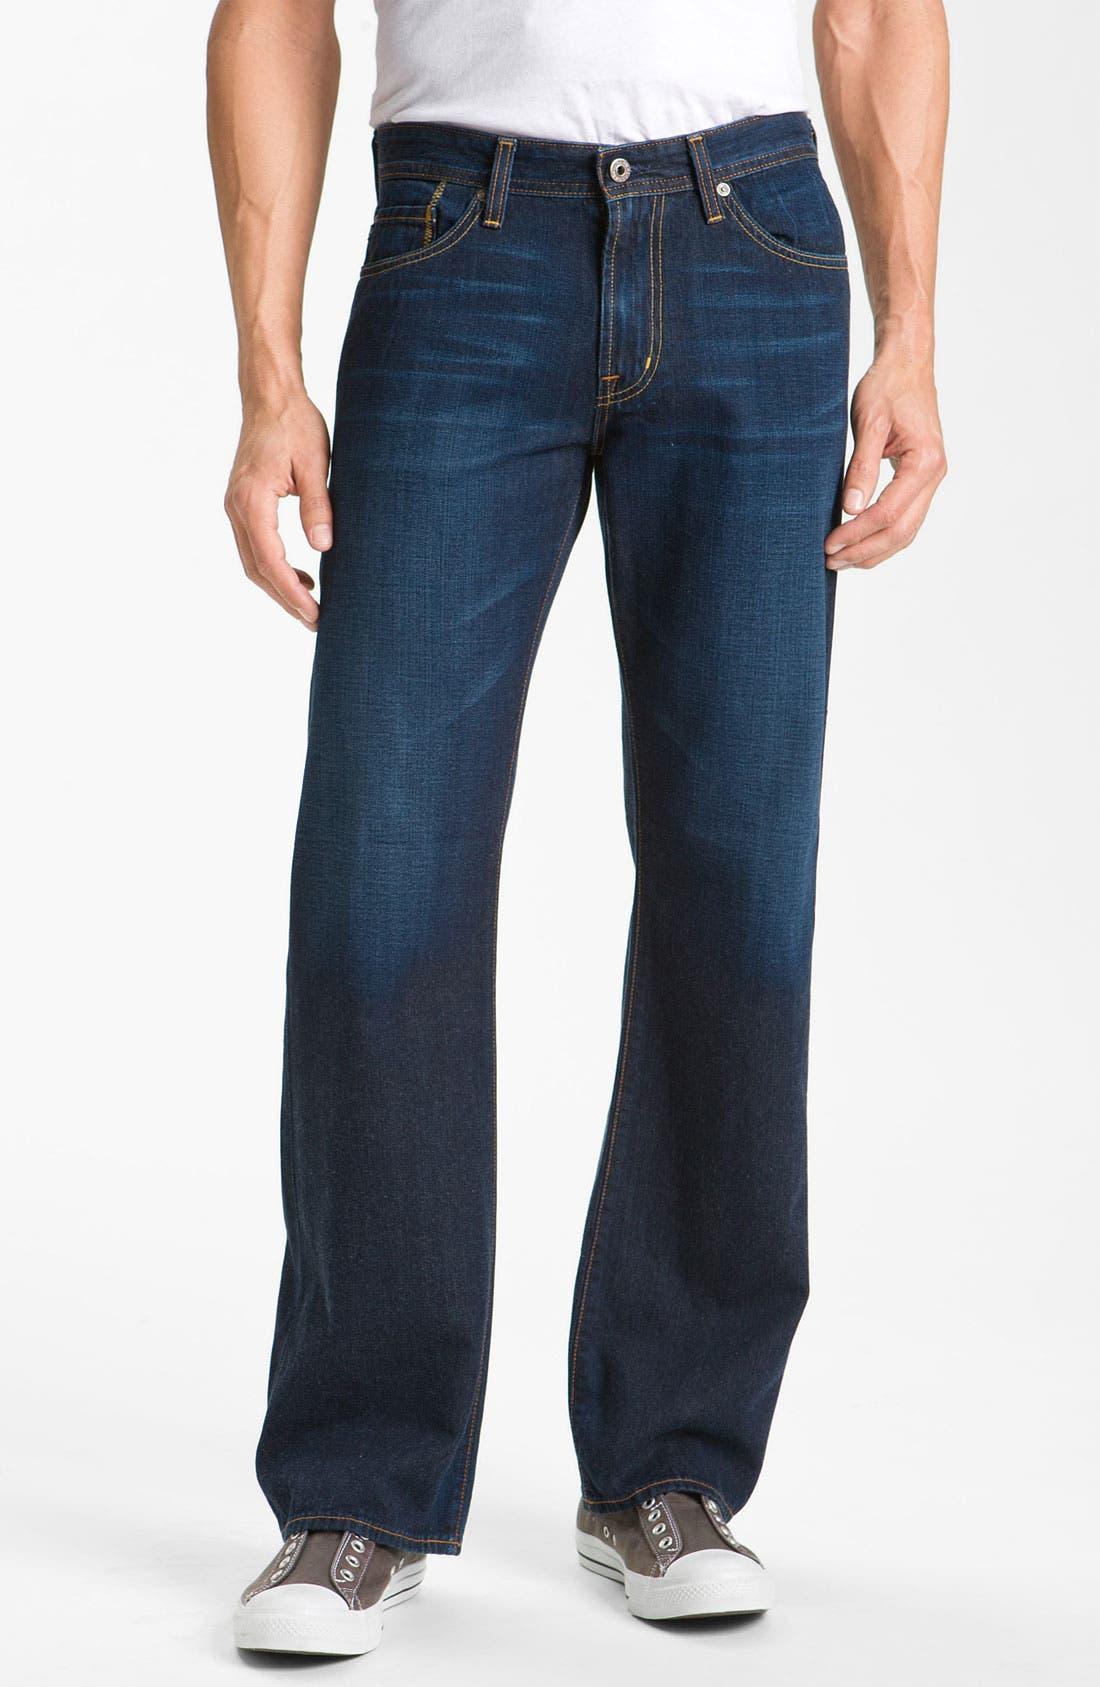 Alternate Image 1 Selected - AG Jeans 'Hero' Relaxed Leg Jeans (Barrow)